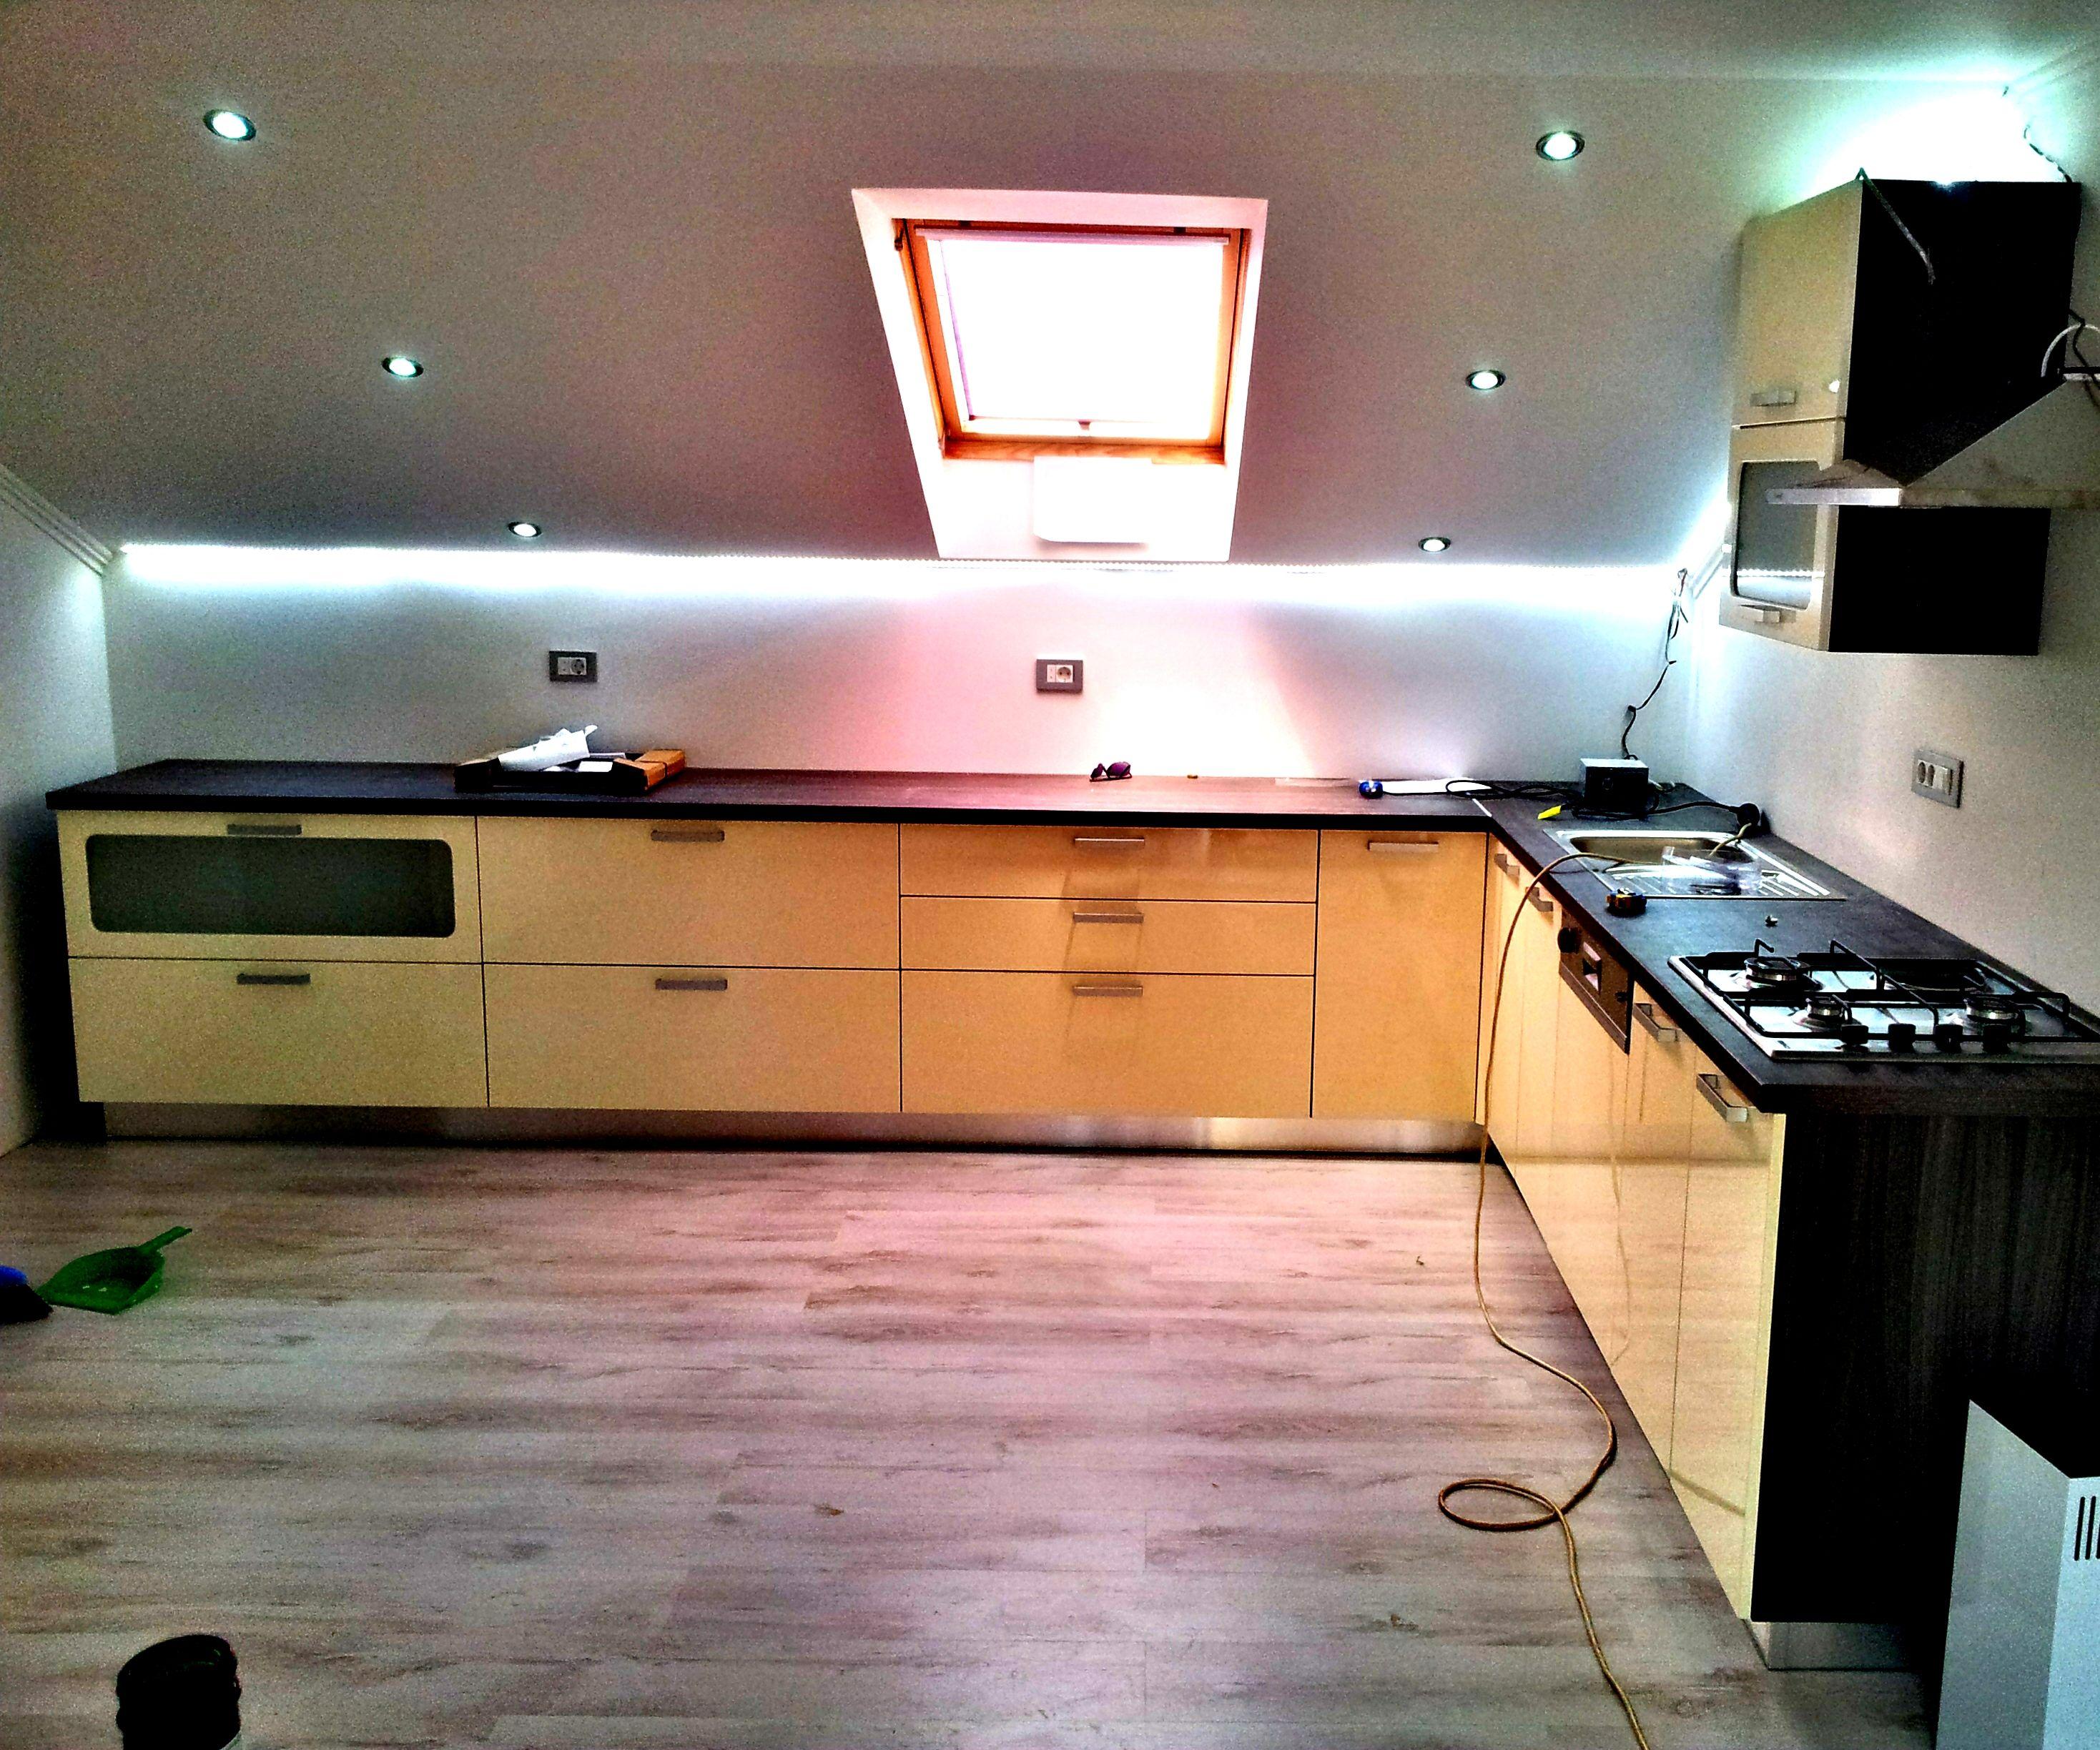 LED Lighting - renovating the old